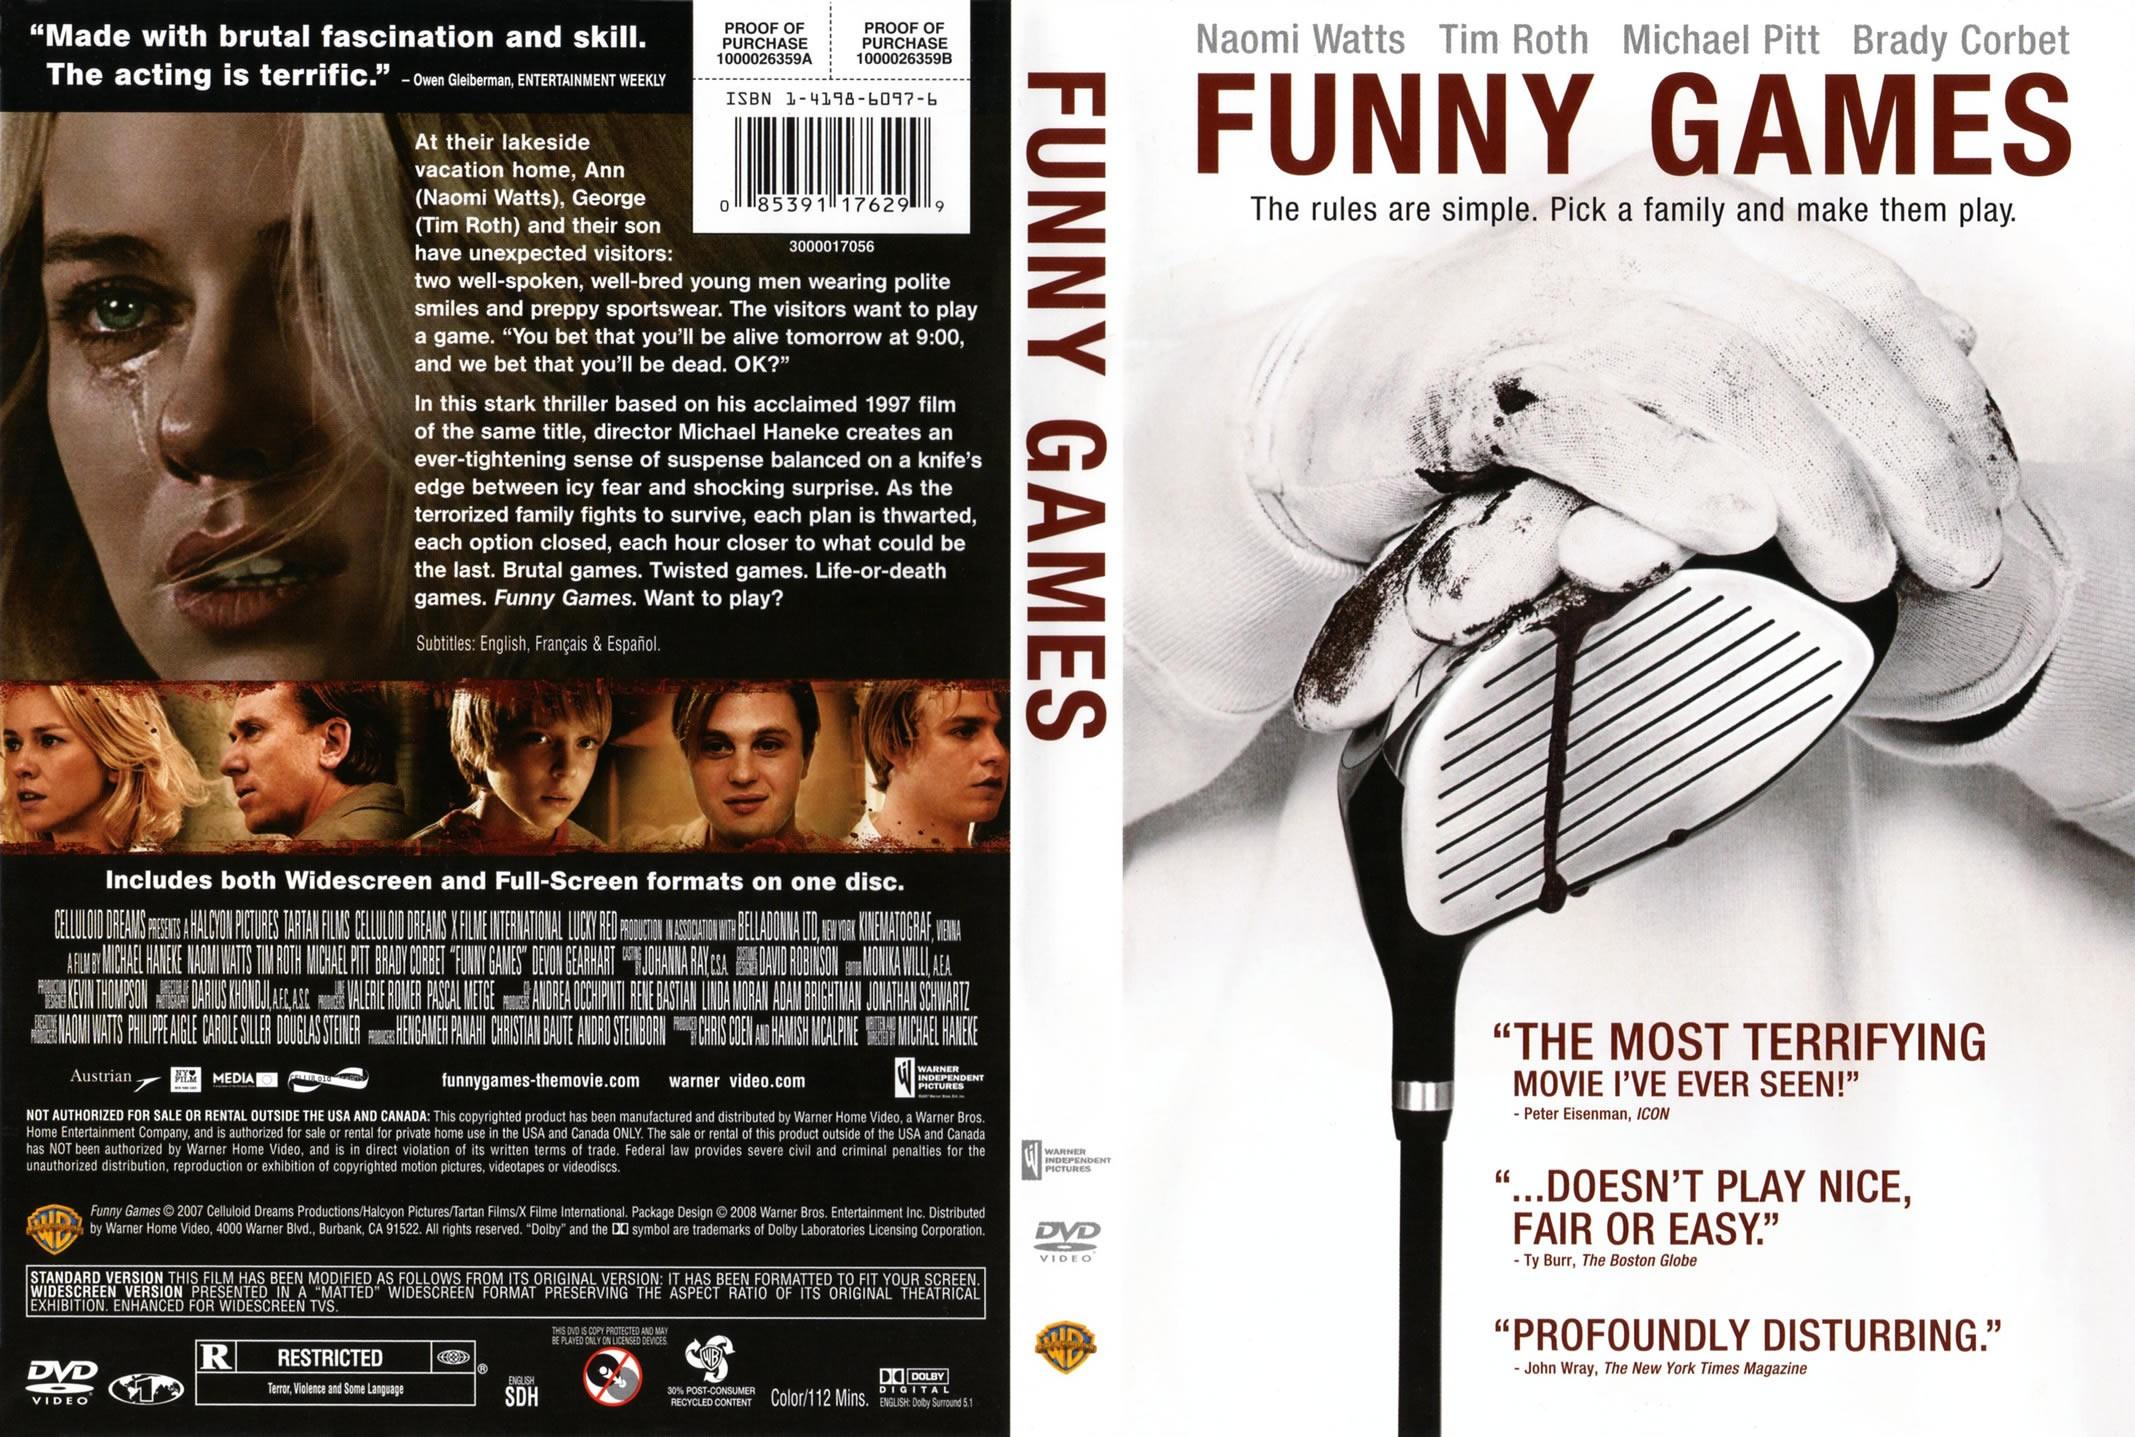 Funny Games U S 2007 #10